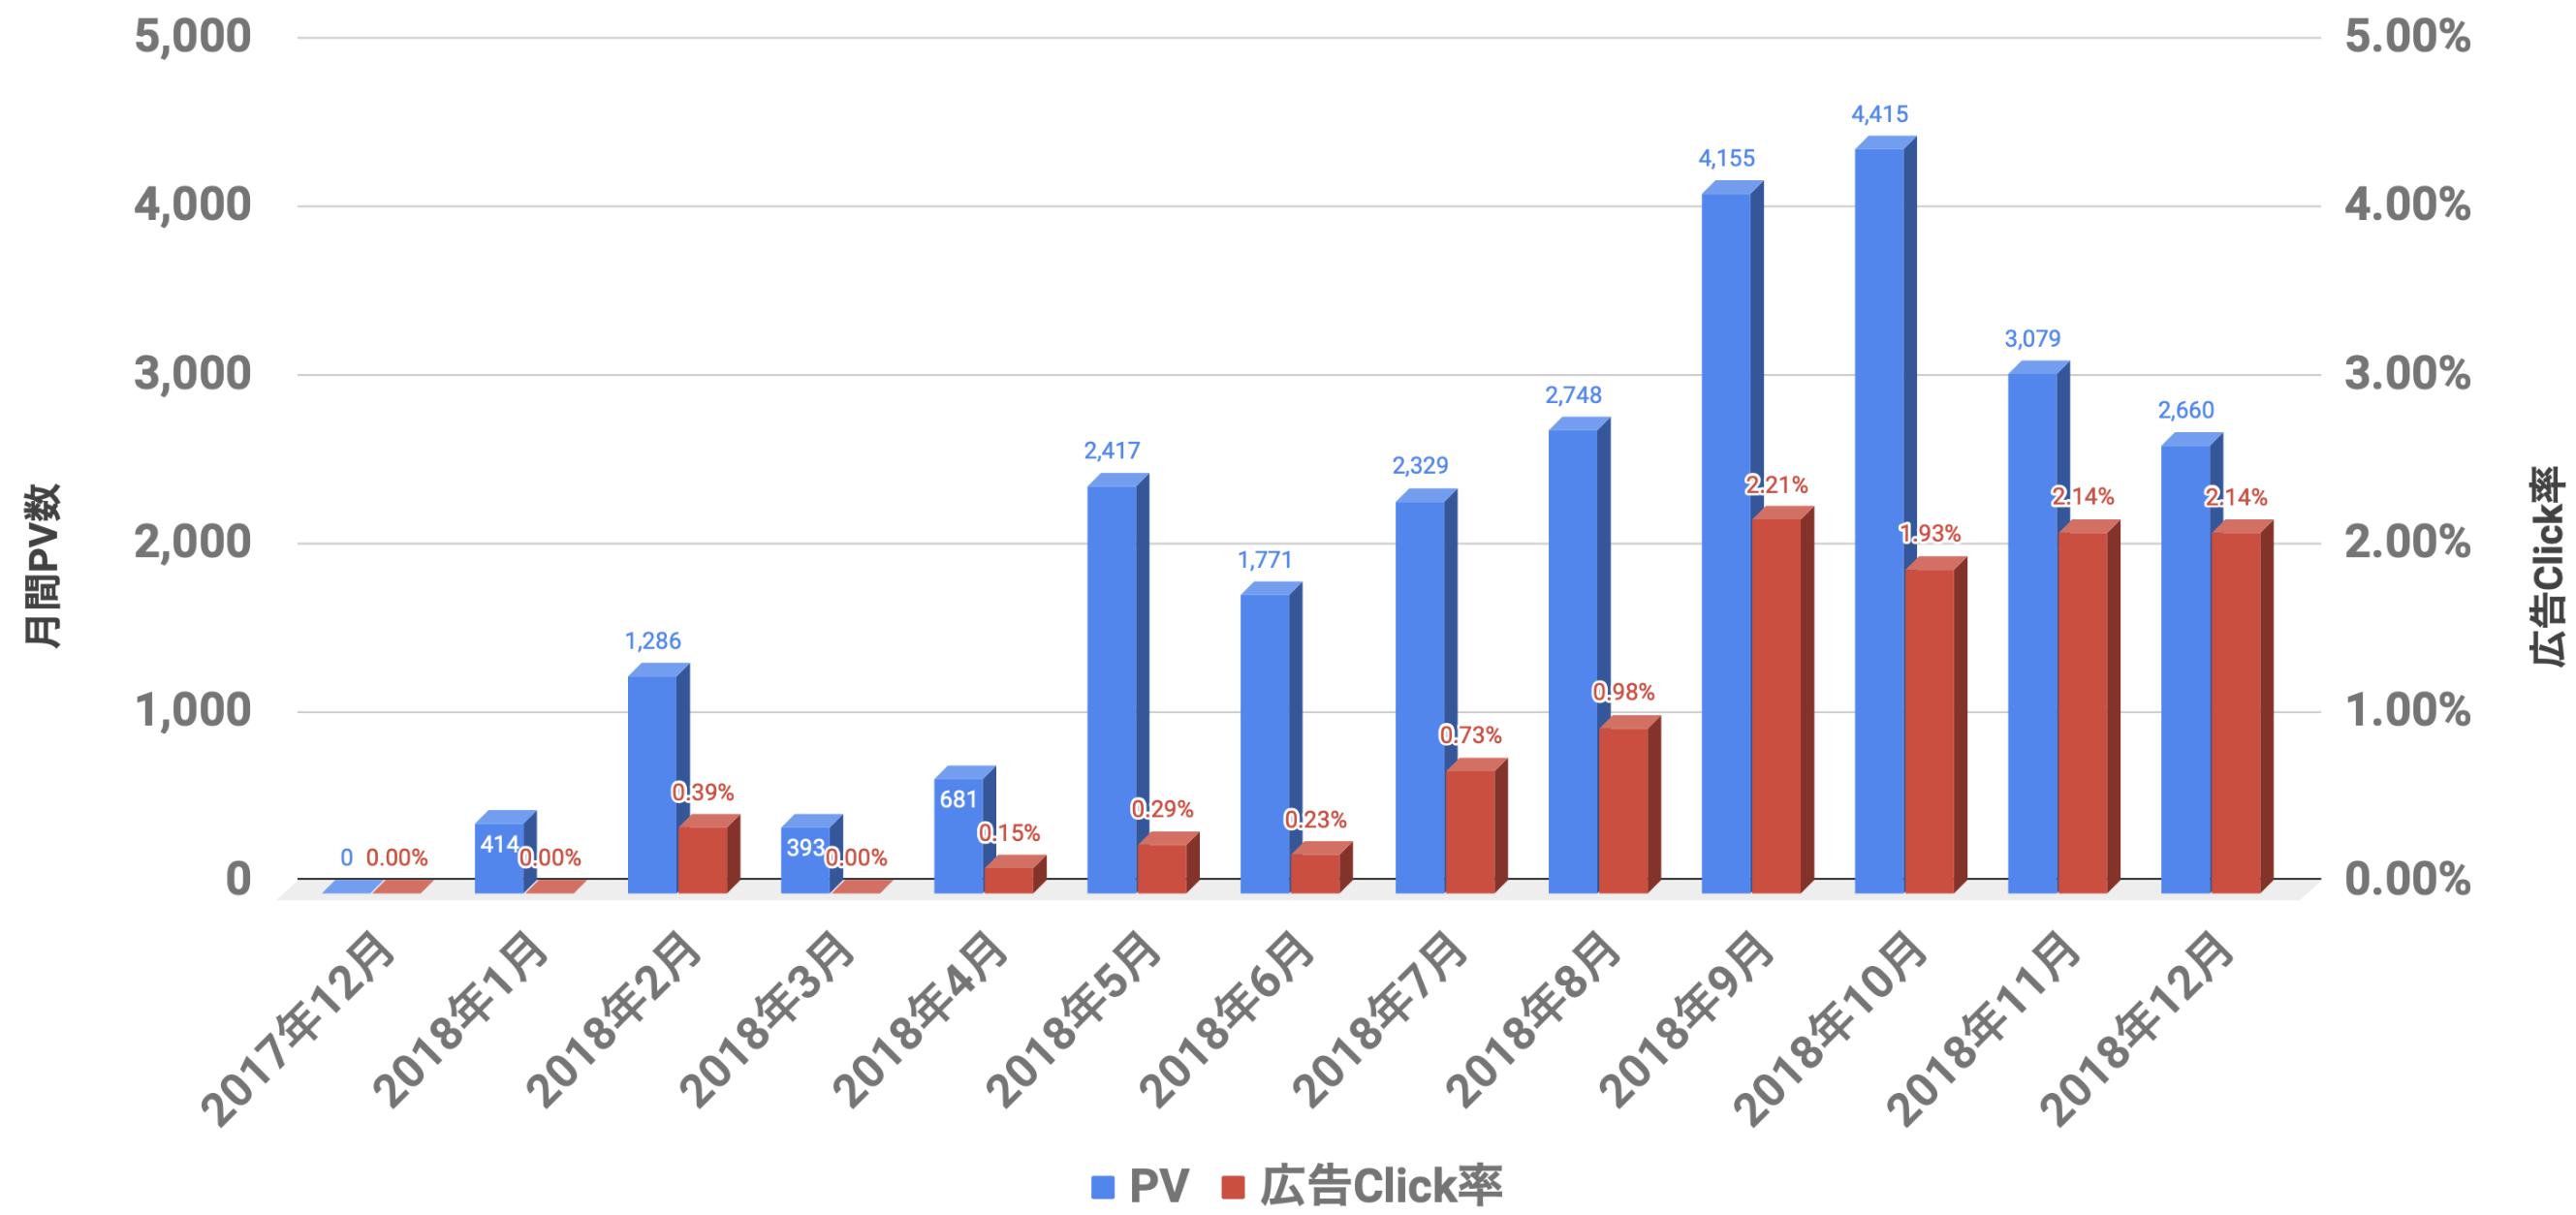 PV,広告,Click率